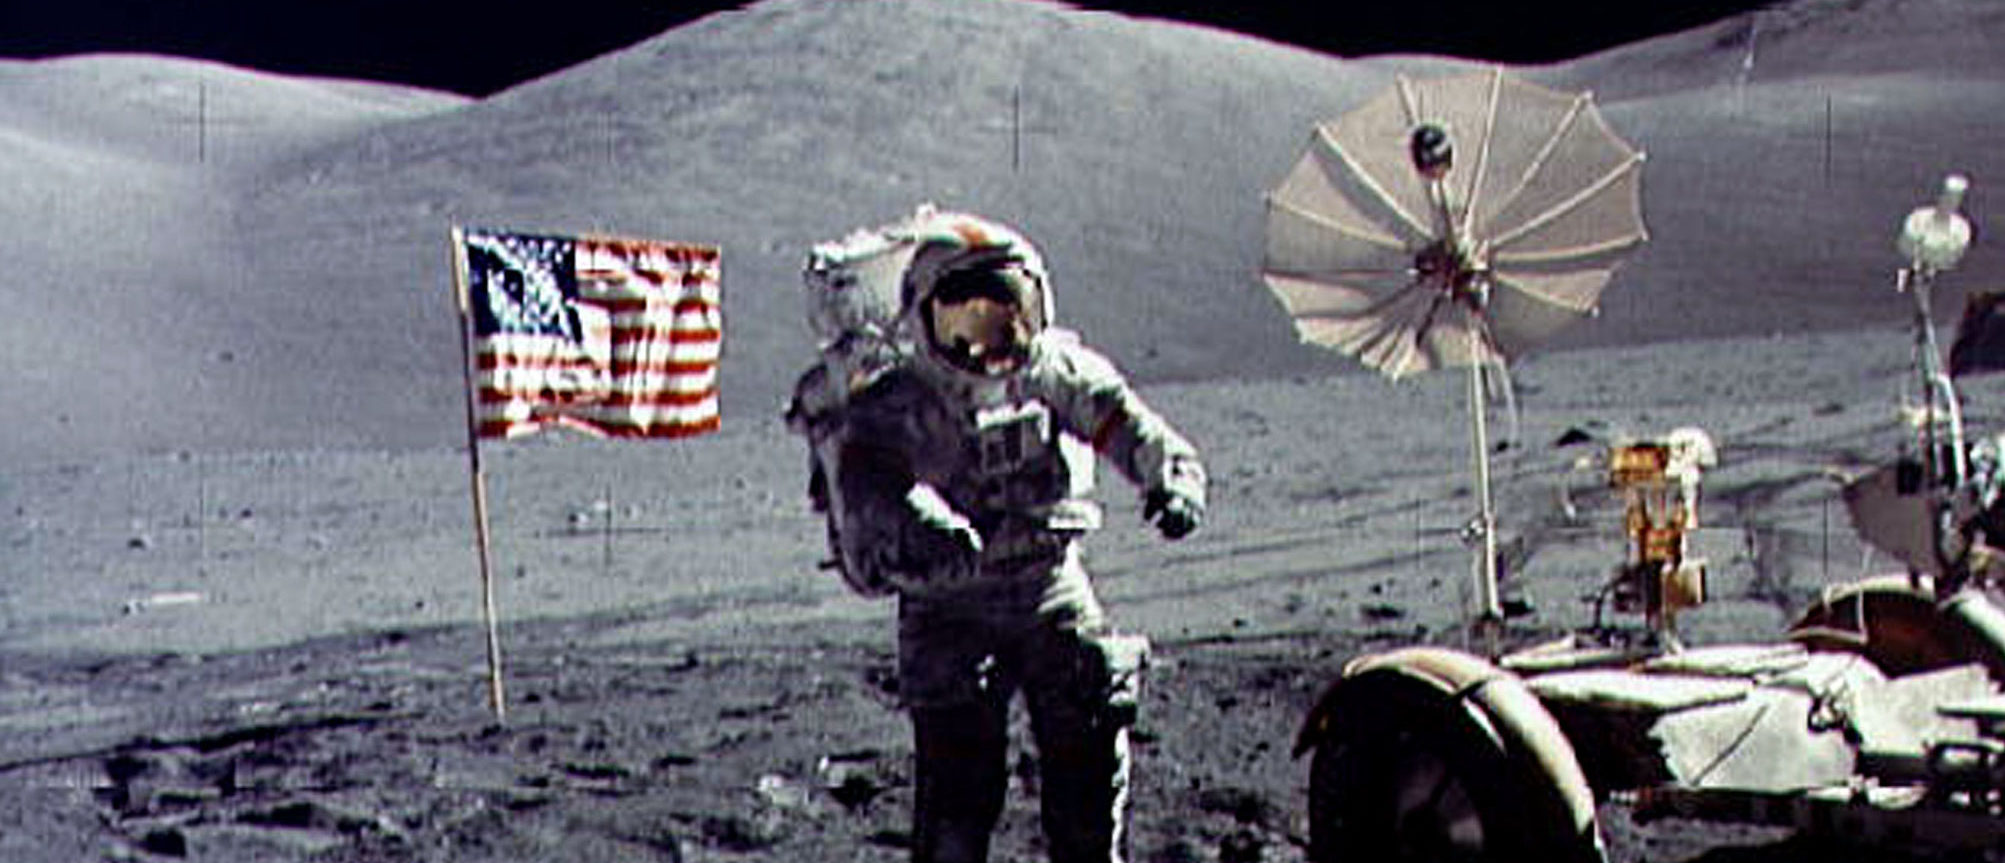 NASA announced the opening of 50-year-old sealed moon rocks (NASA)